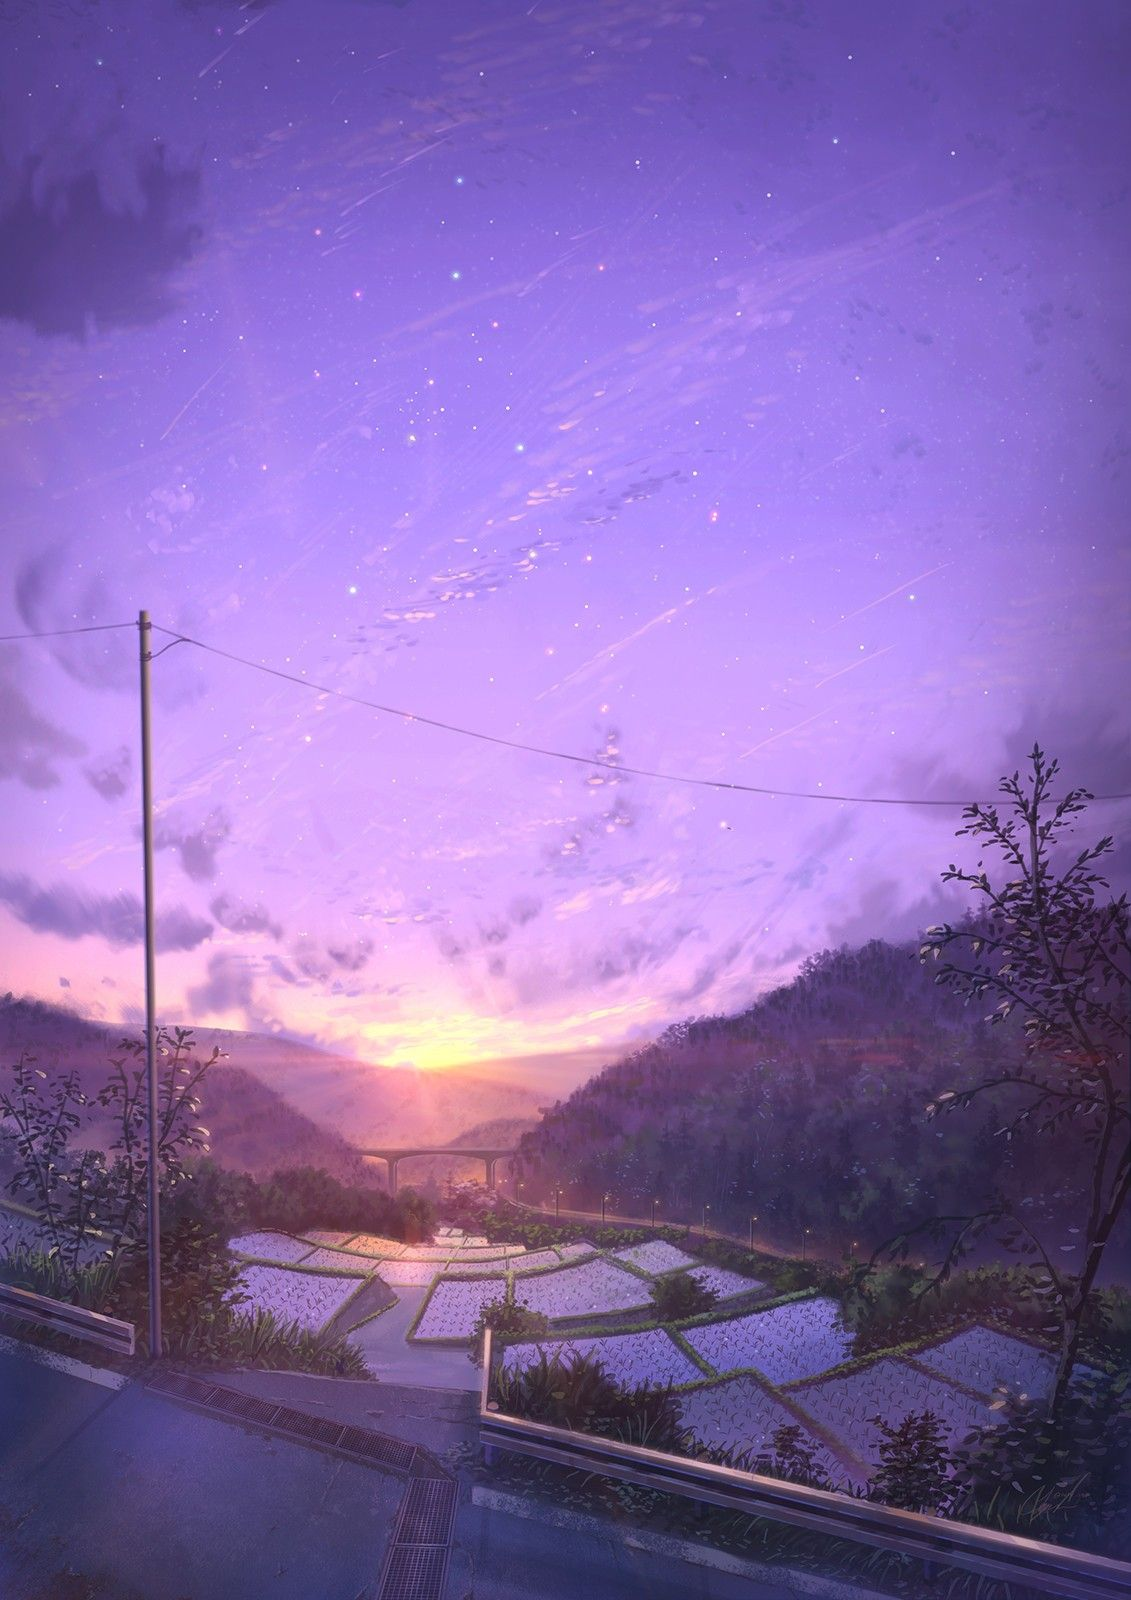 anime sky Wallpaper AnimeWallpaper Kawaii Art